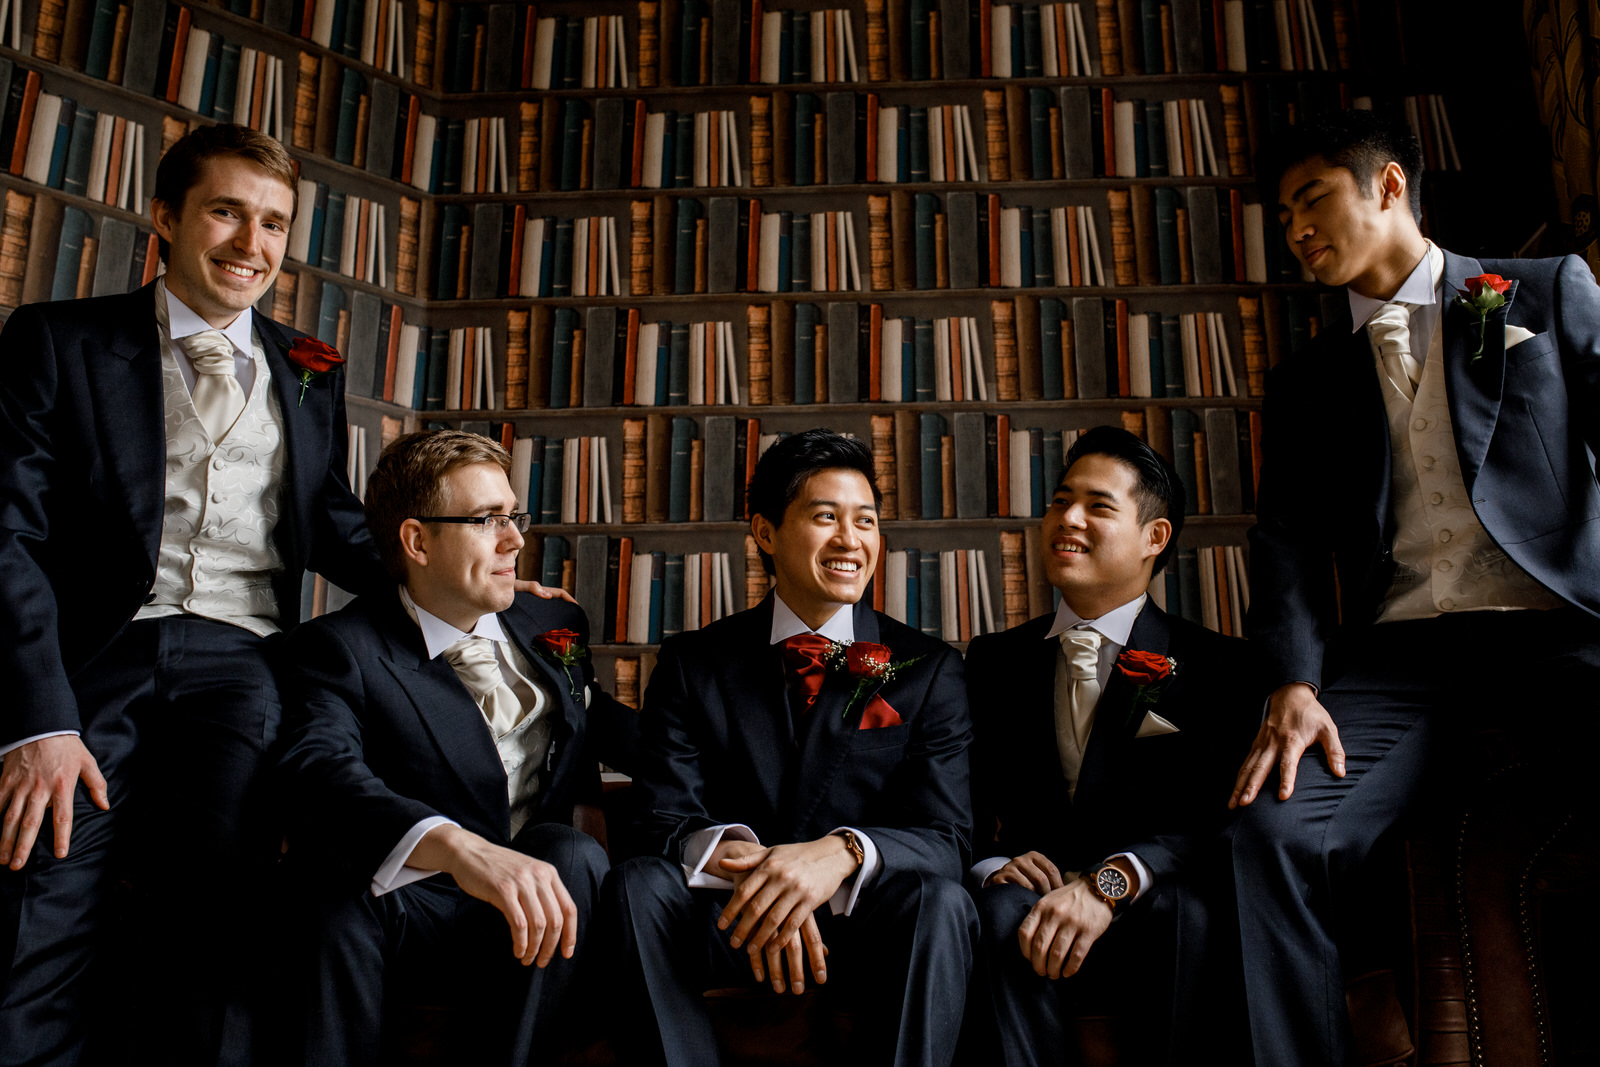 groom portraits at hedsor house